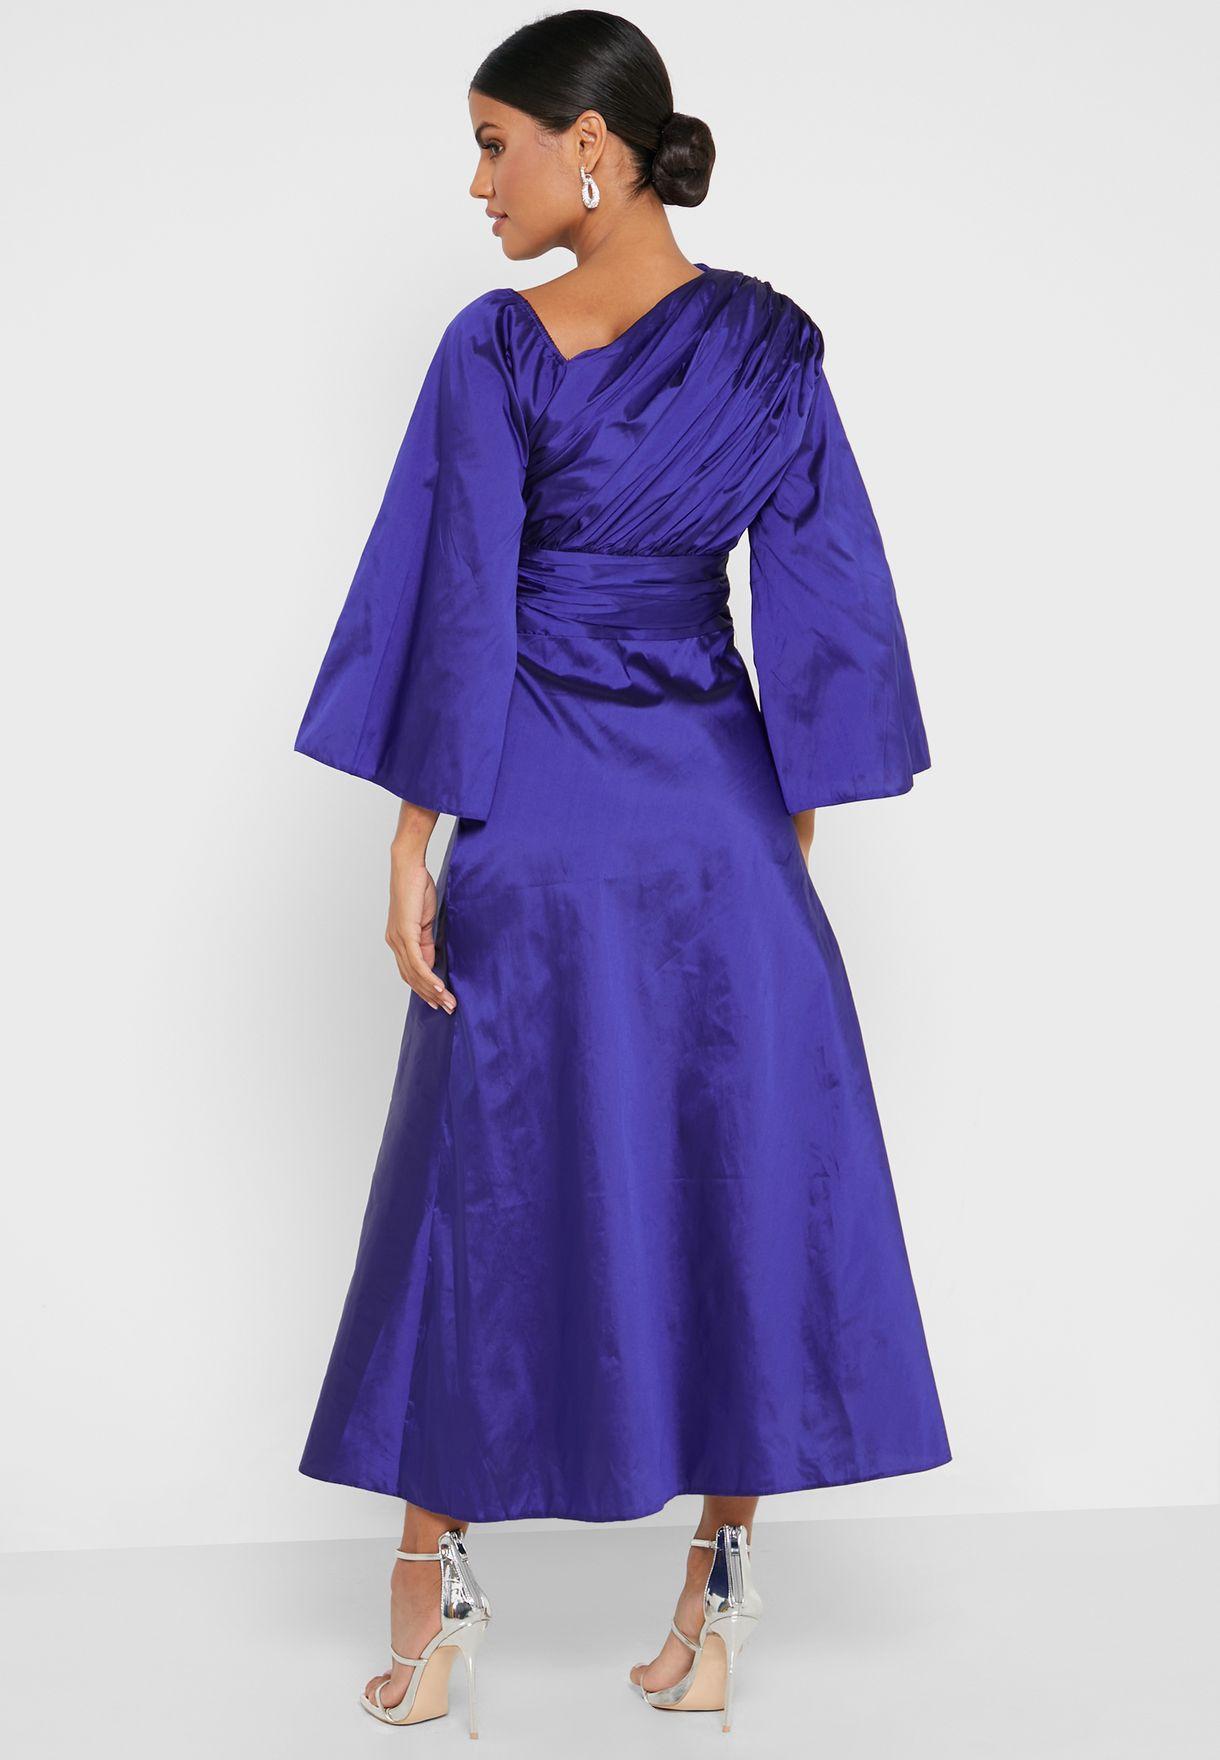 Draped Neckline Detail Dress